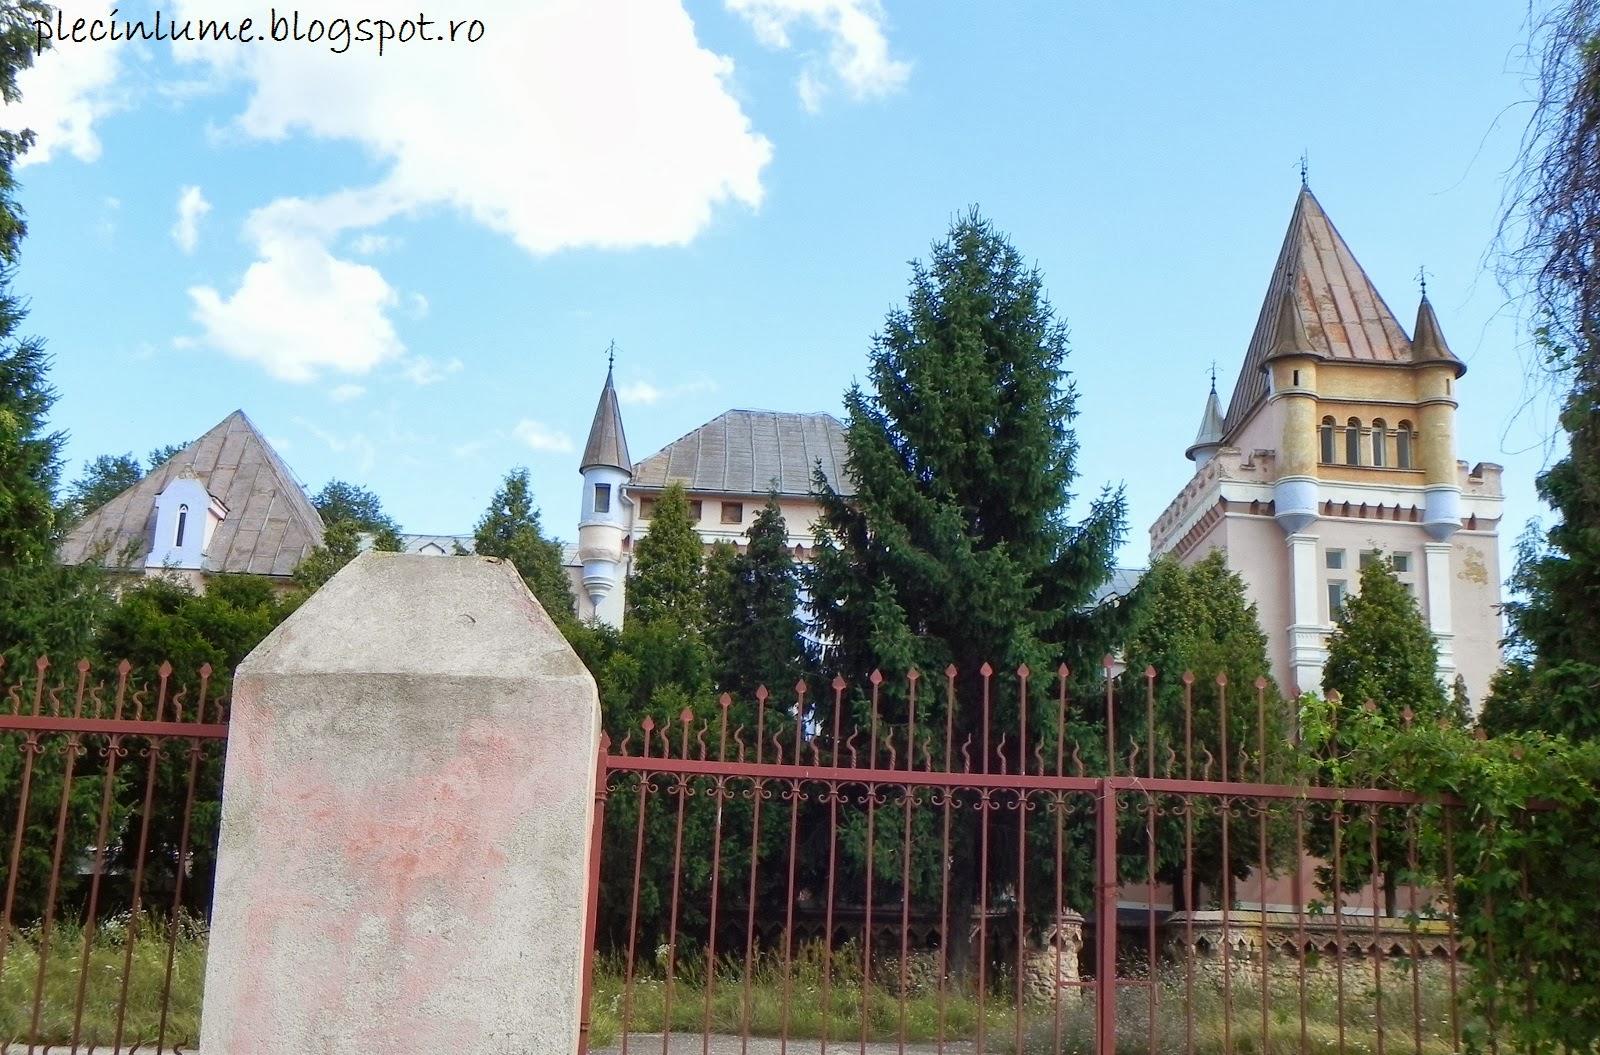 Castelul Kendeffy din Santamarie Orlea